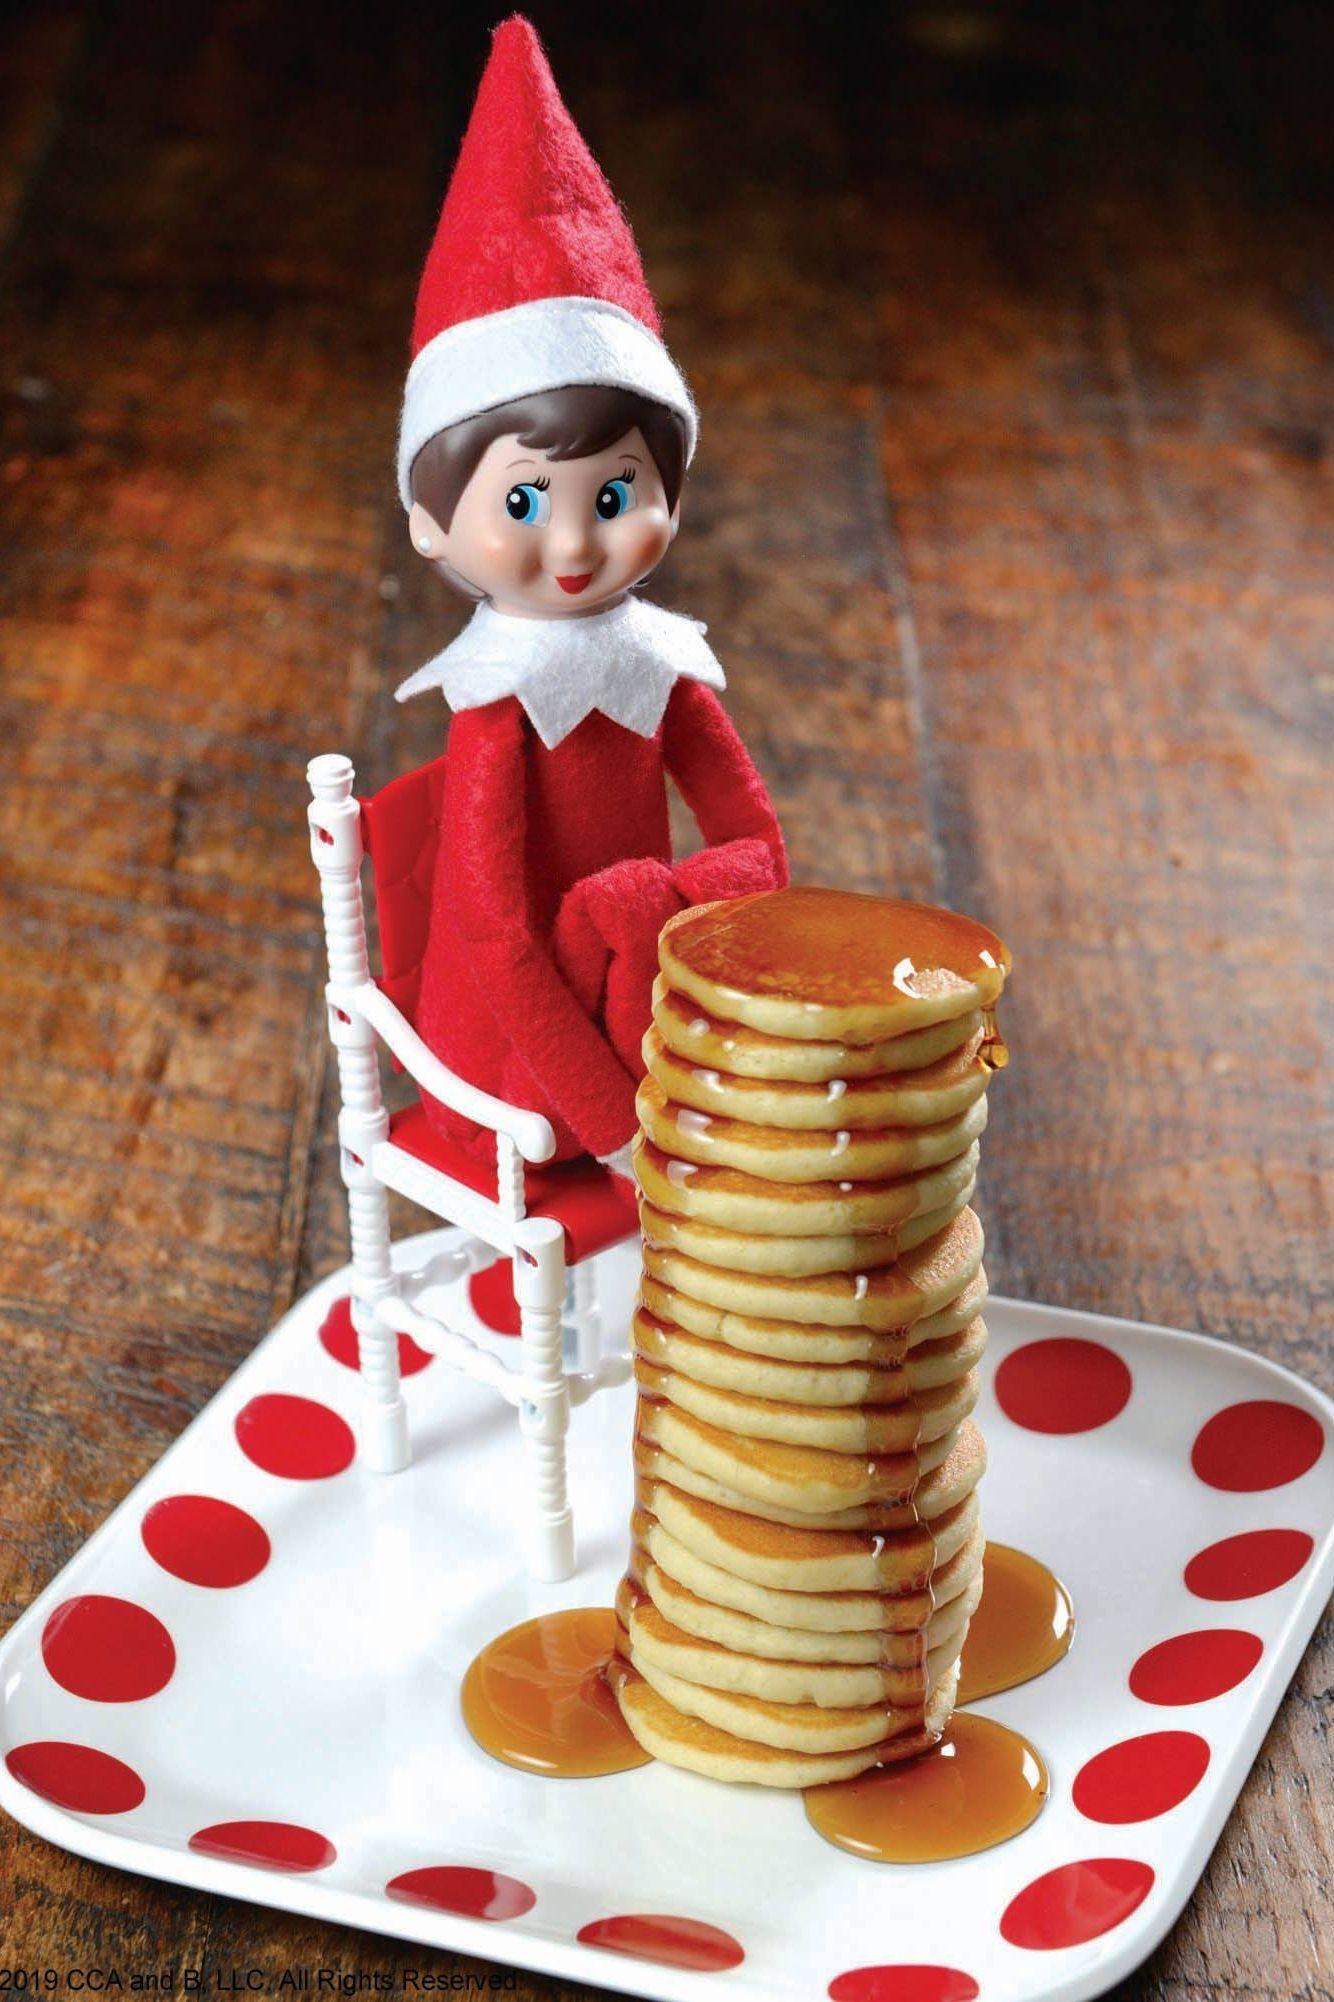 50 Funny Elf on the Shelf Ideas to Entertain Your Kids All Season